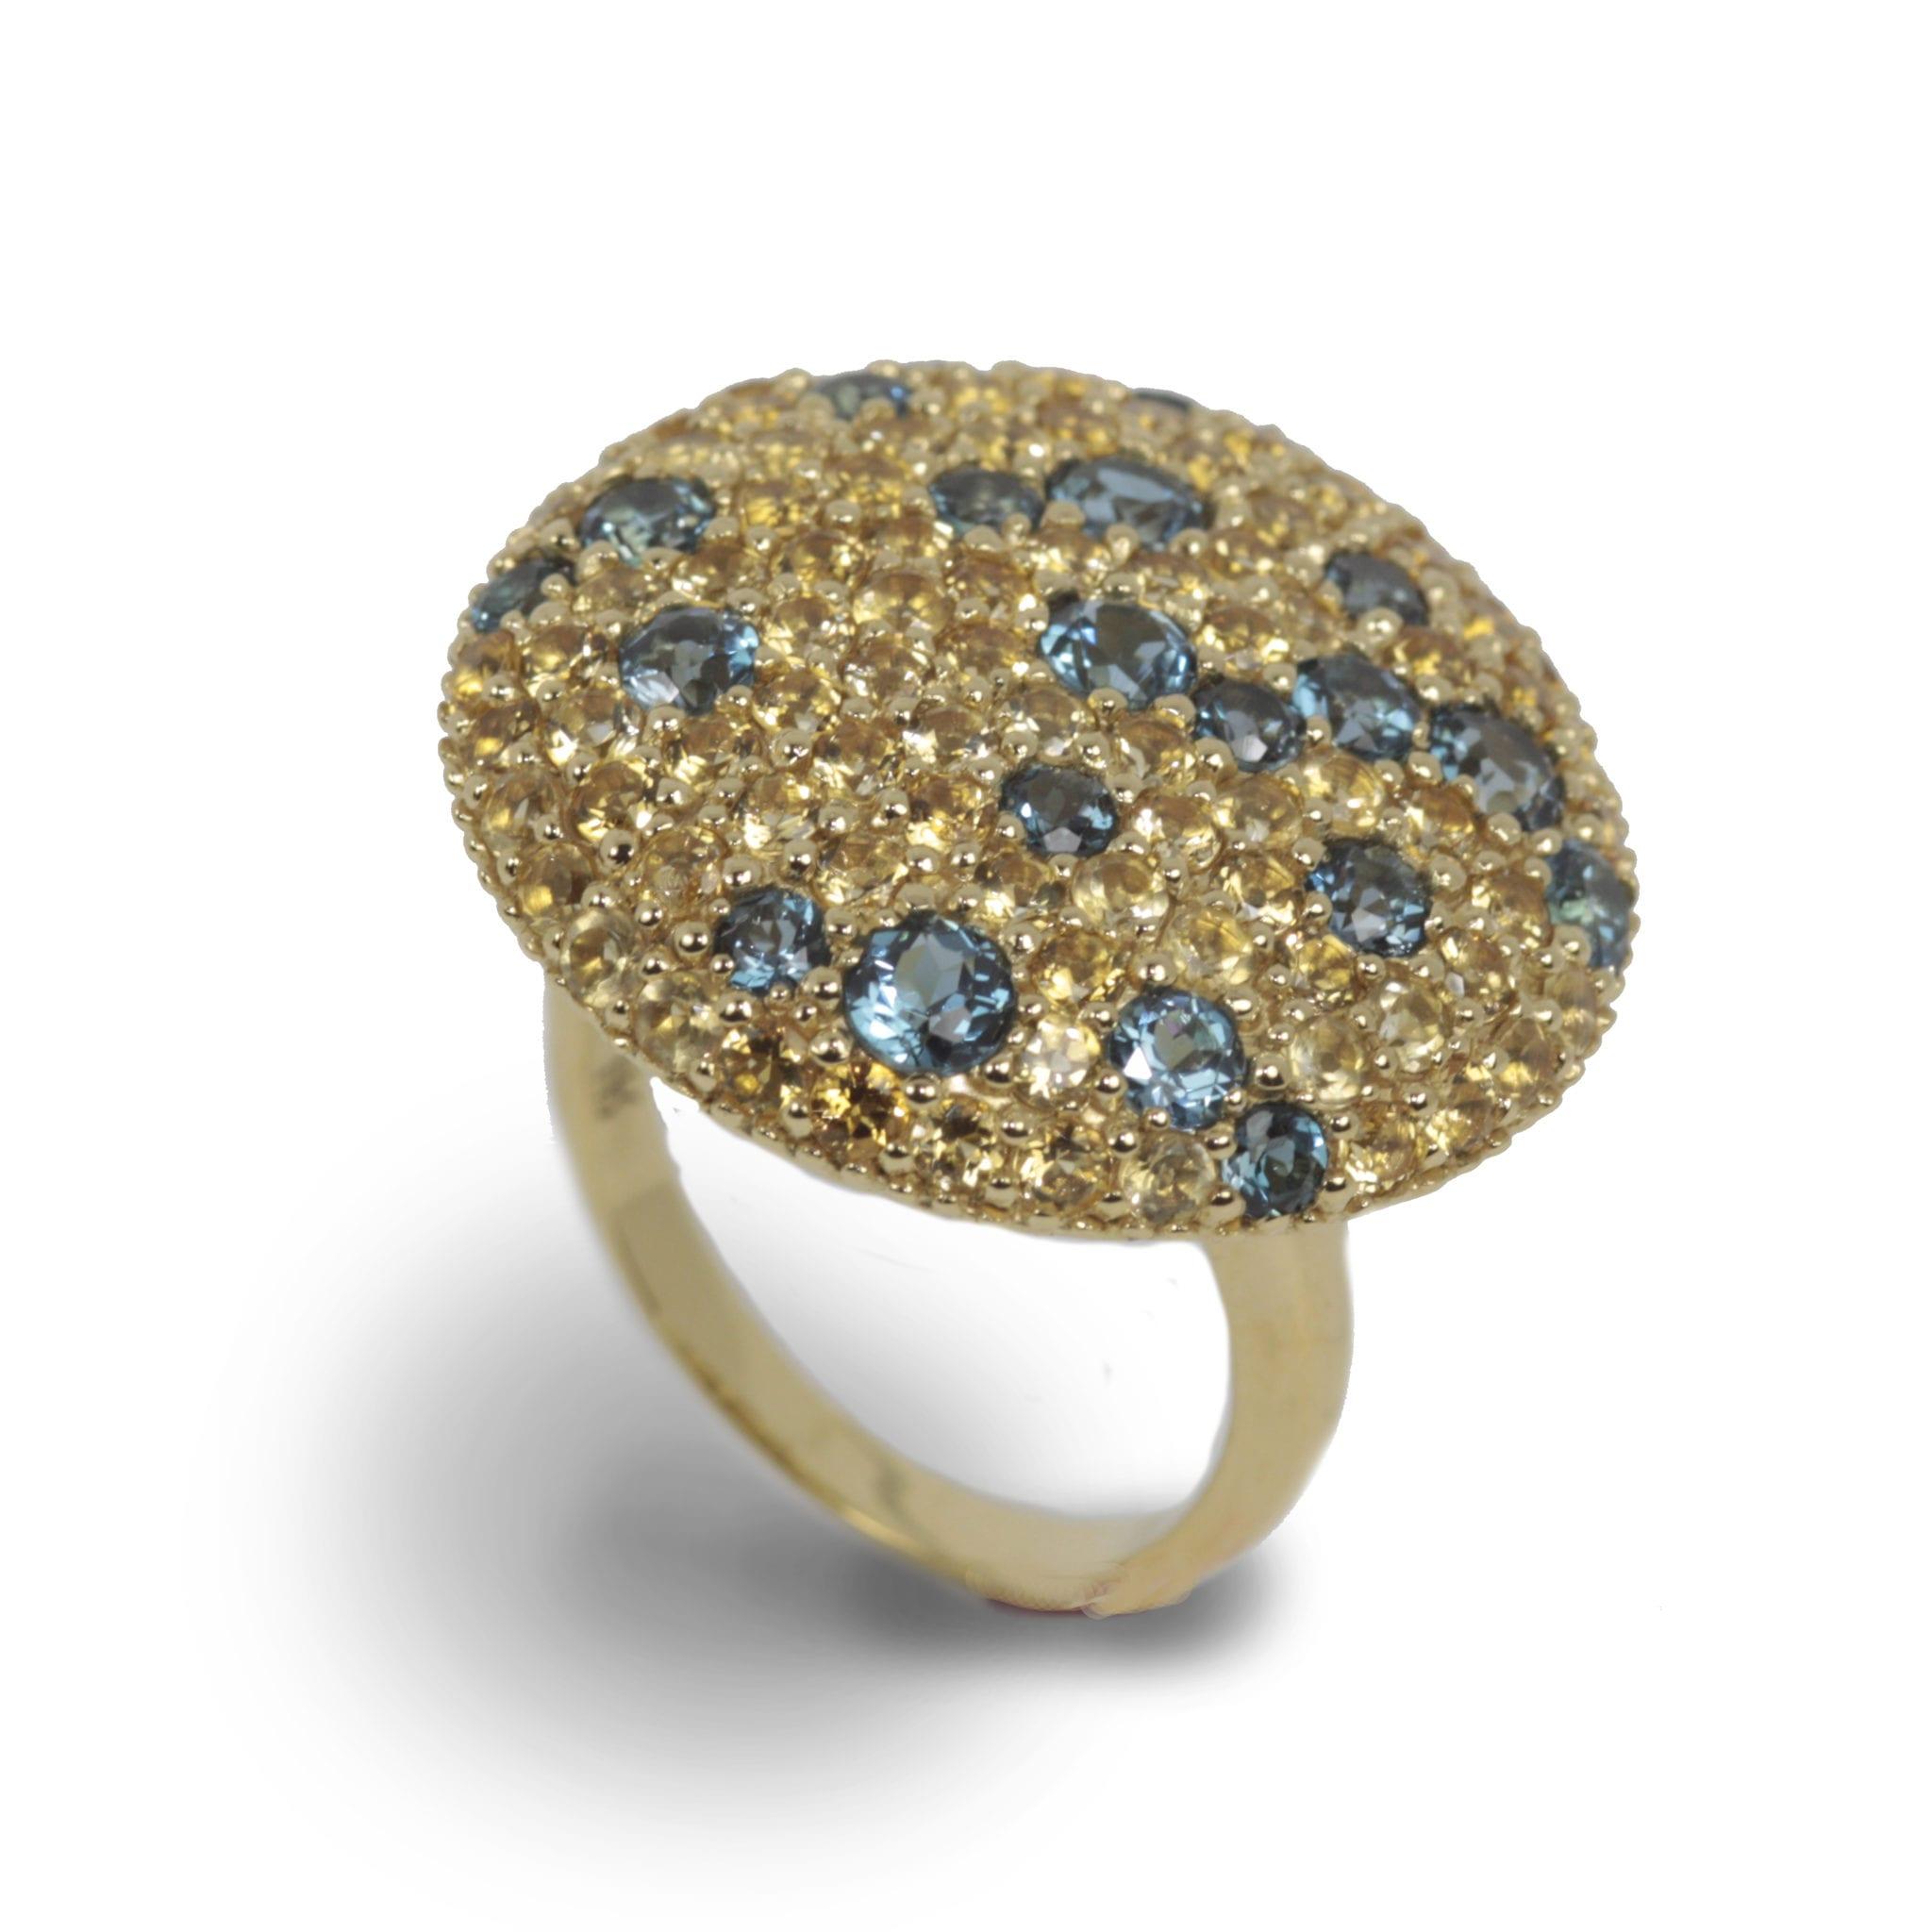 Richters Jewelry & Design Studio Londonderry New Hampshire